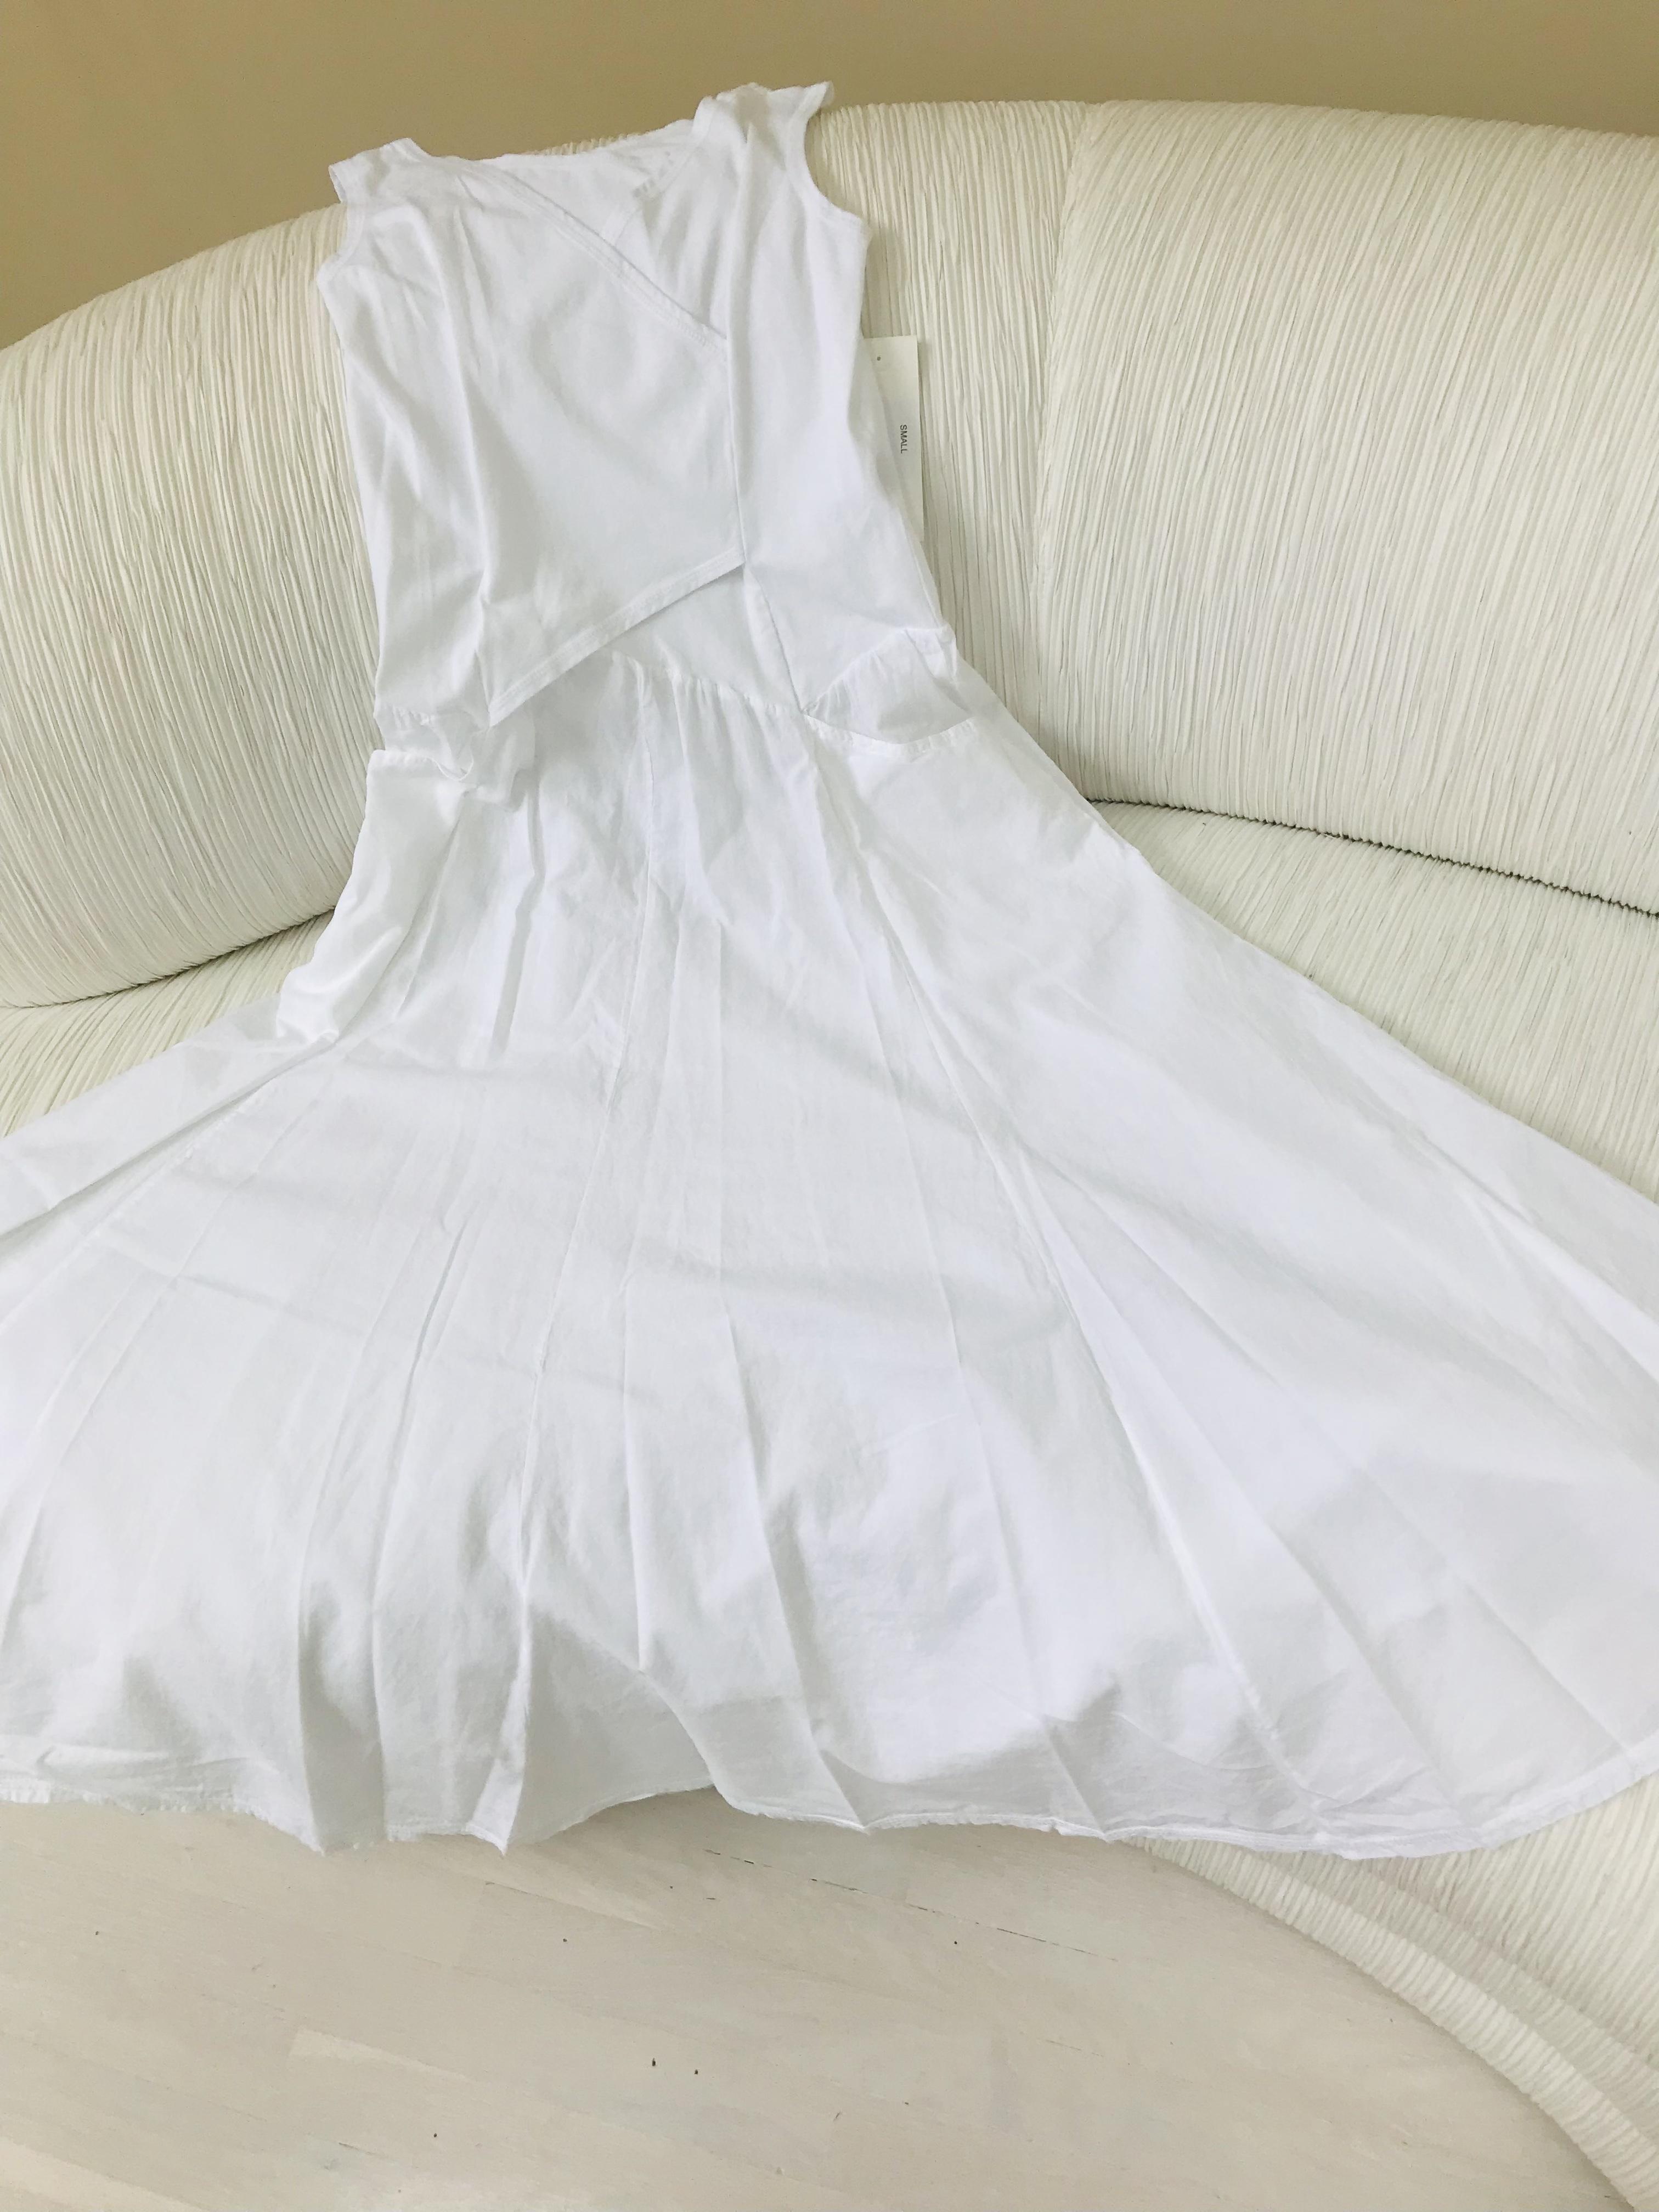 Luna Luz: Cross Over Bodice Maxi Dress (Ships Immed in White, 2 Left!) LL_516_WHITE